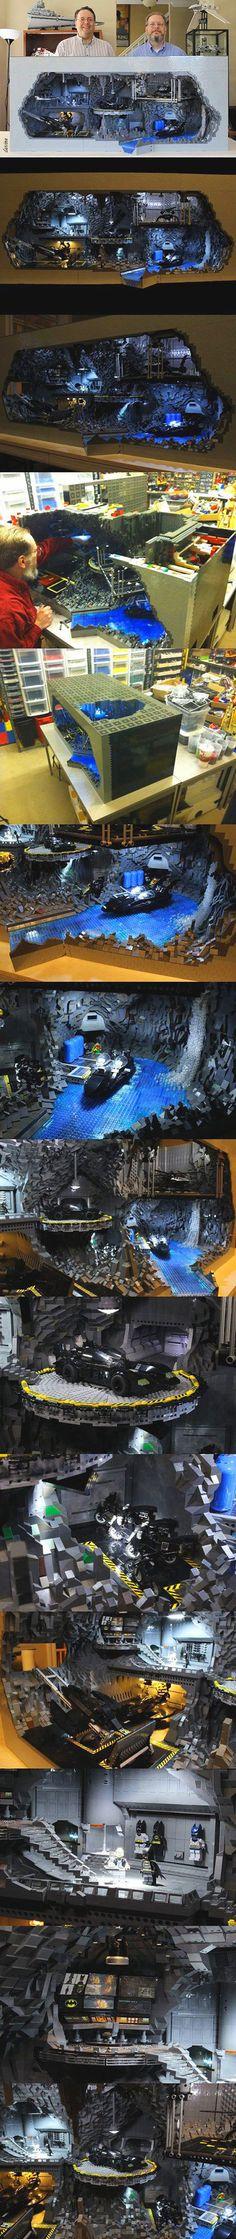 This LEGO master recreated Batmans Batcave with 20,000 bricks.